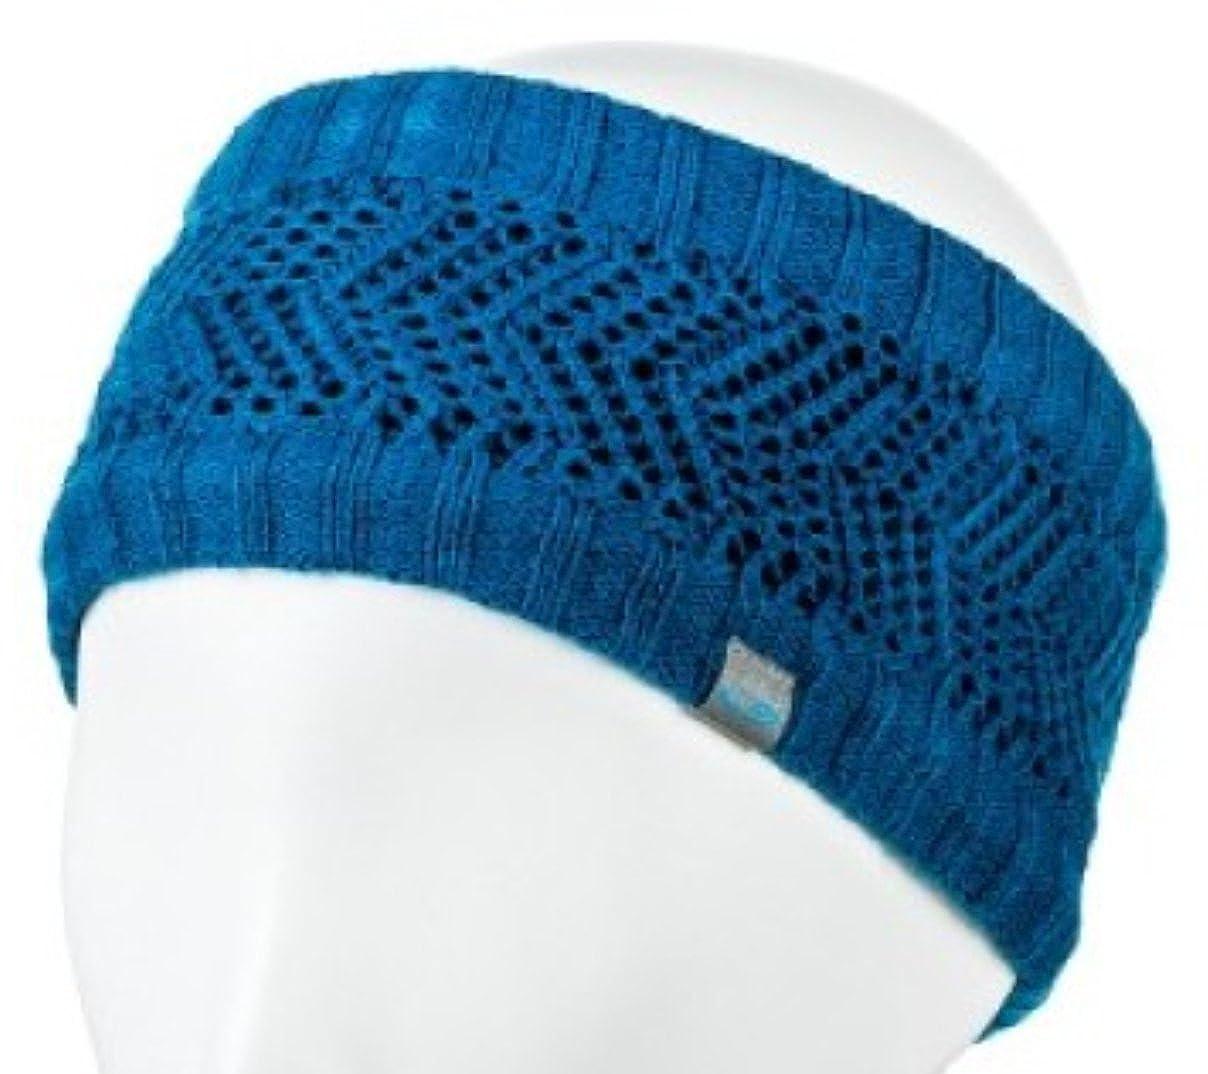 C9 Champion Women's Knit Ear Warmer Headband Masked Brand